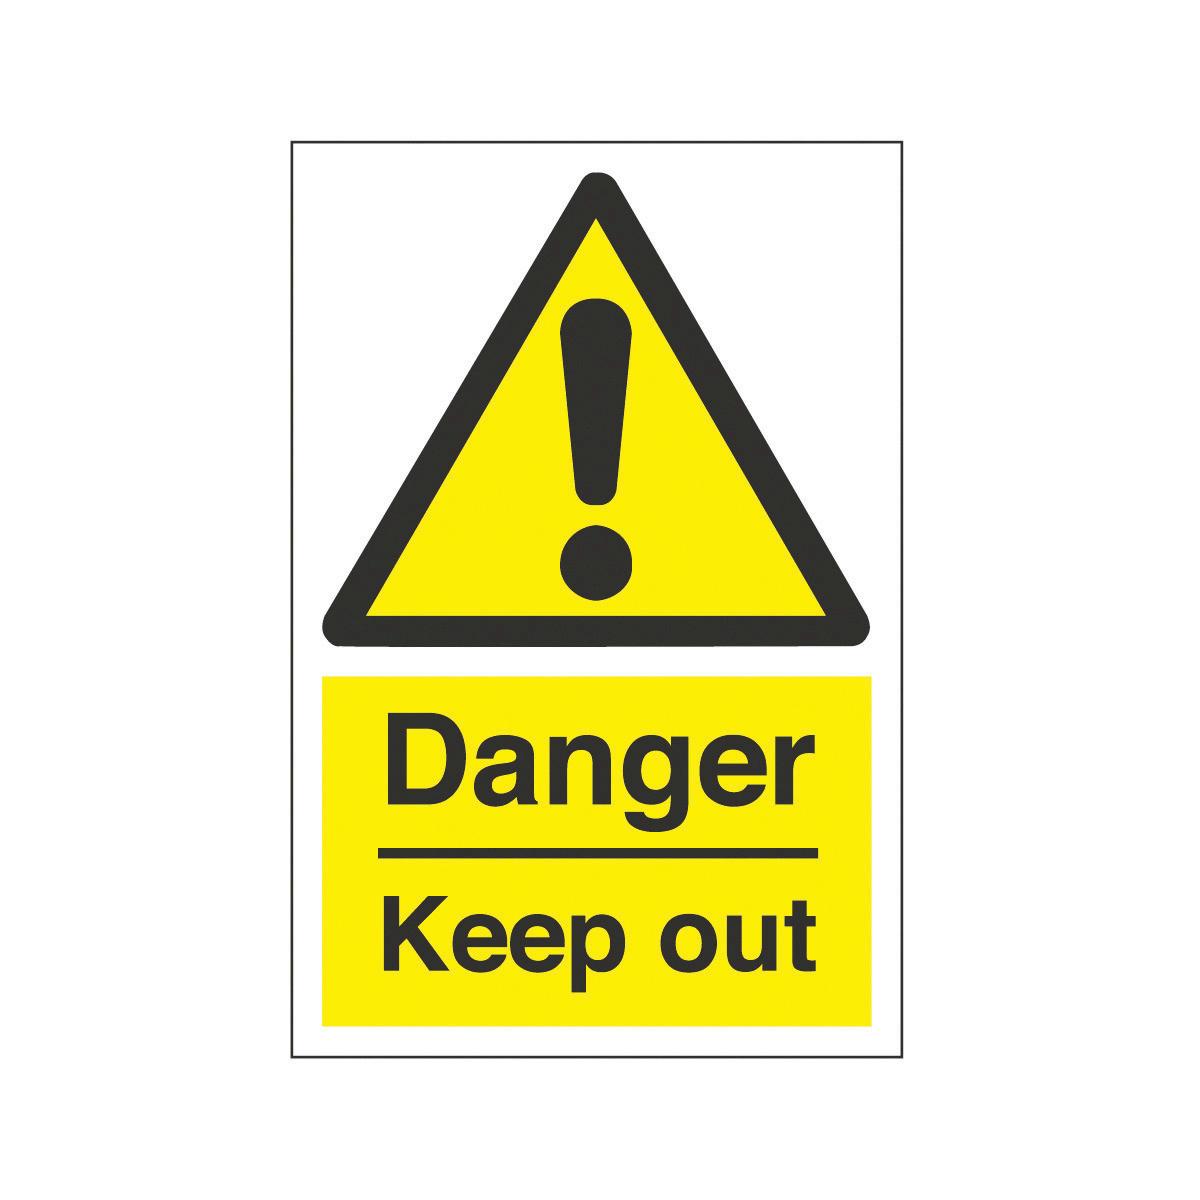 Danger Keep Out Safety Signs From Bigdug Hazard